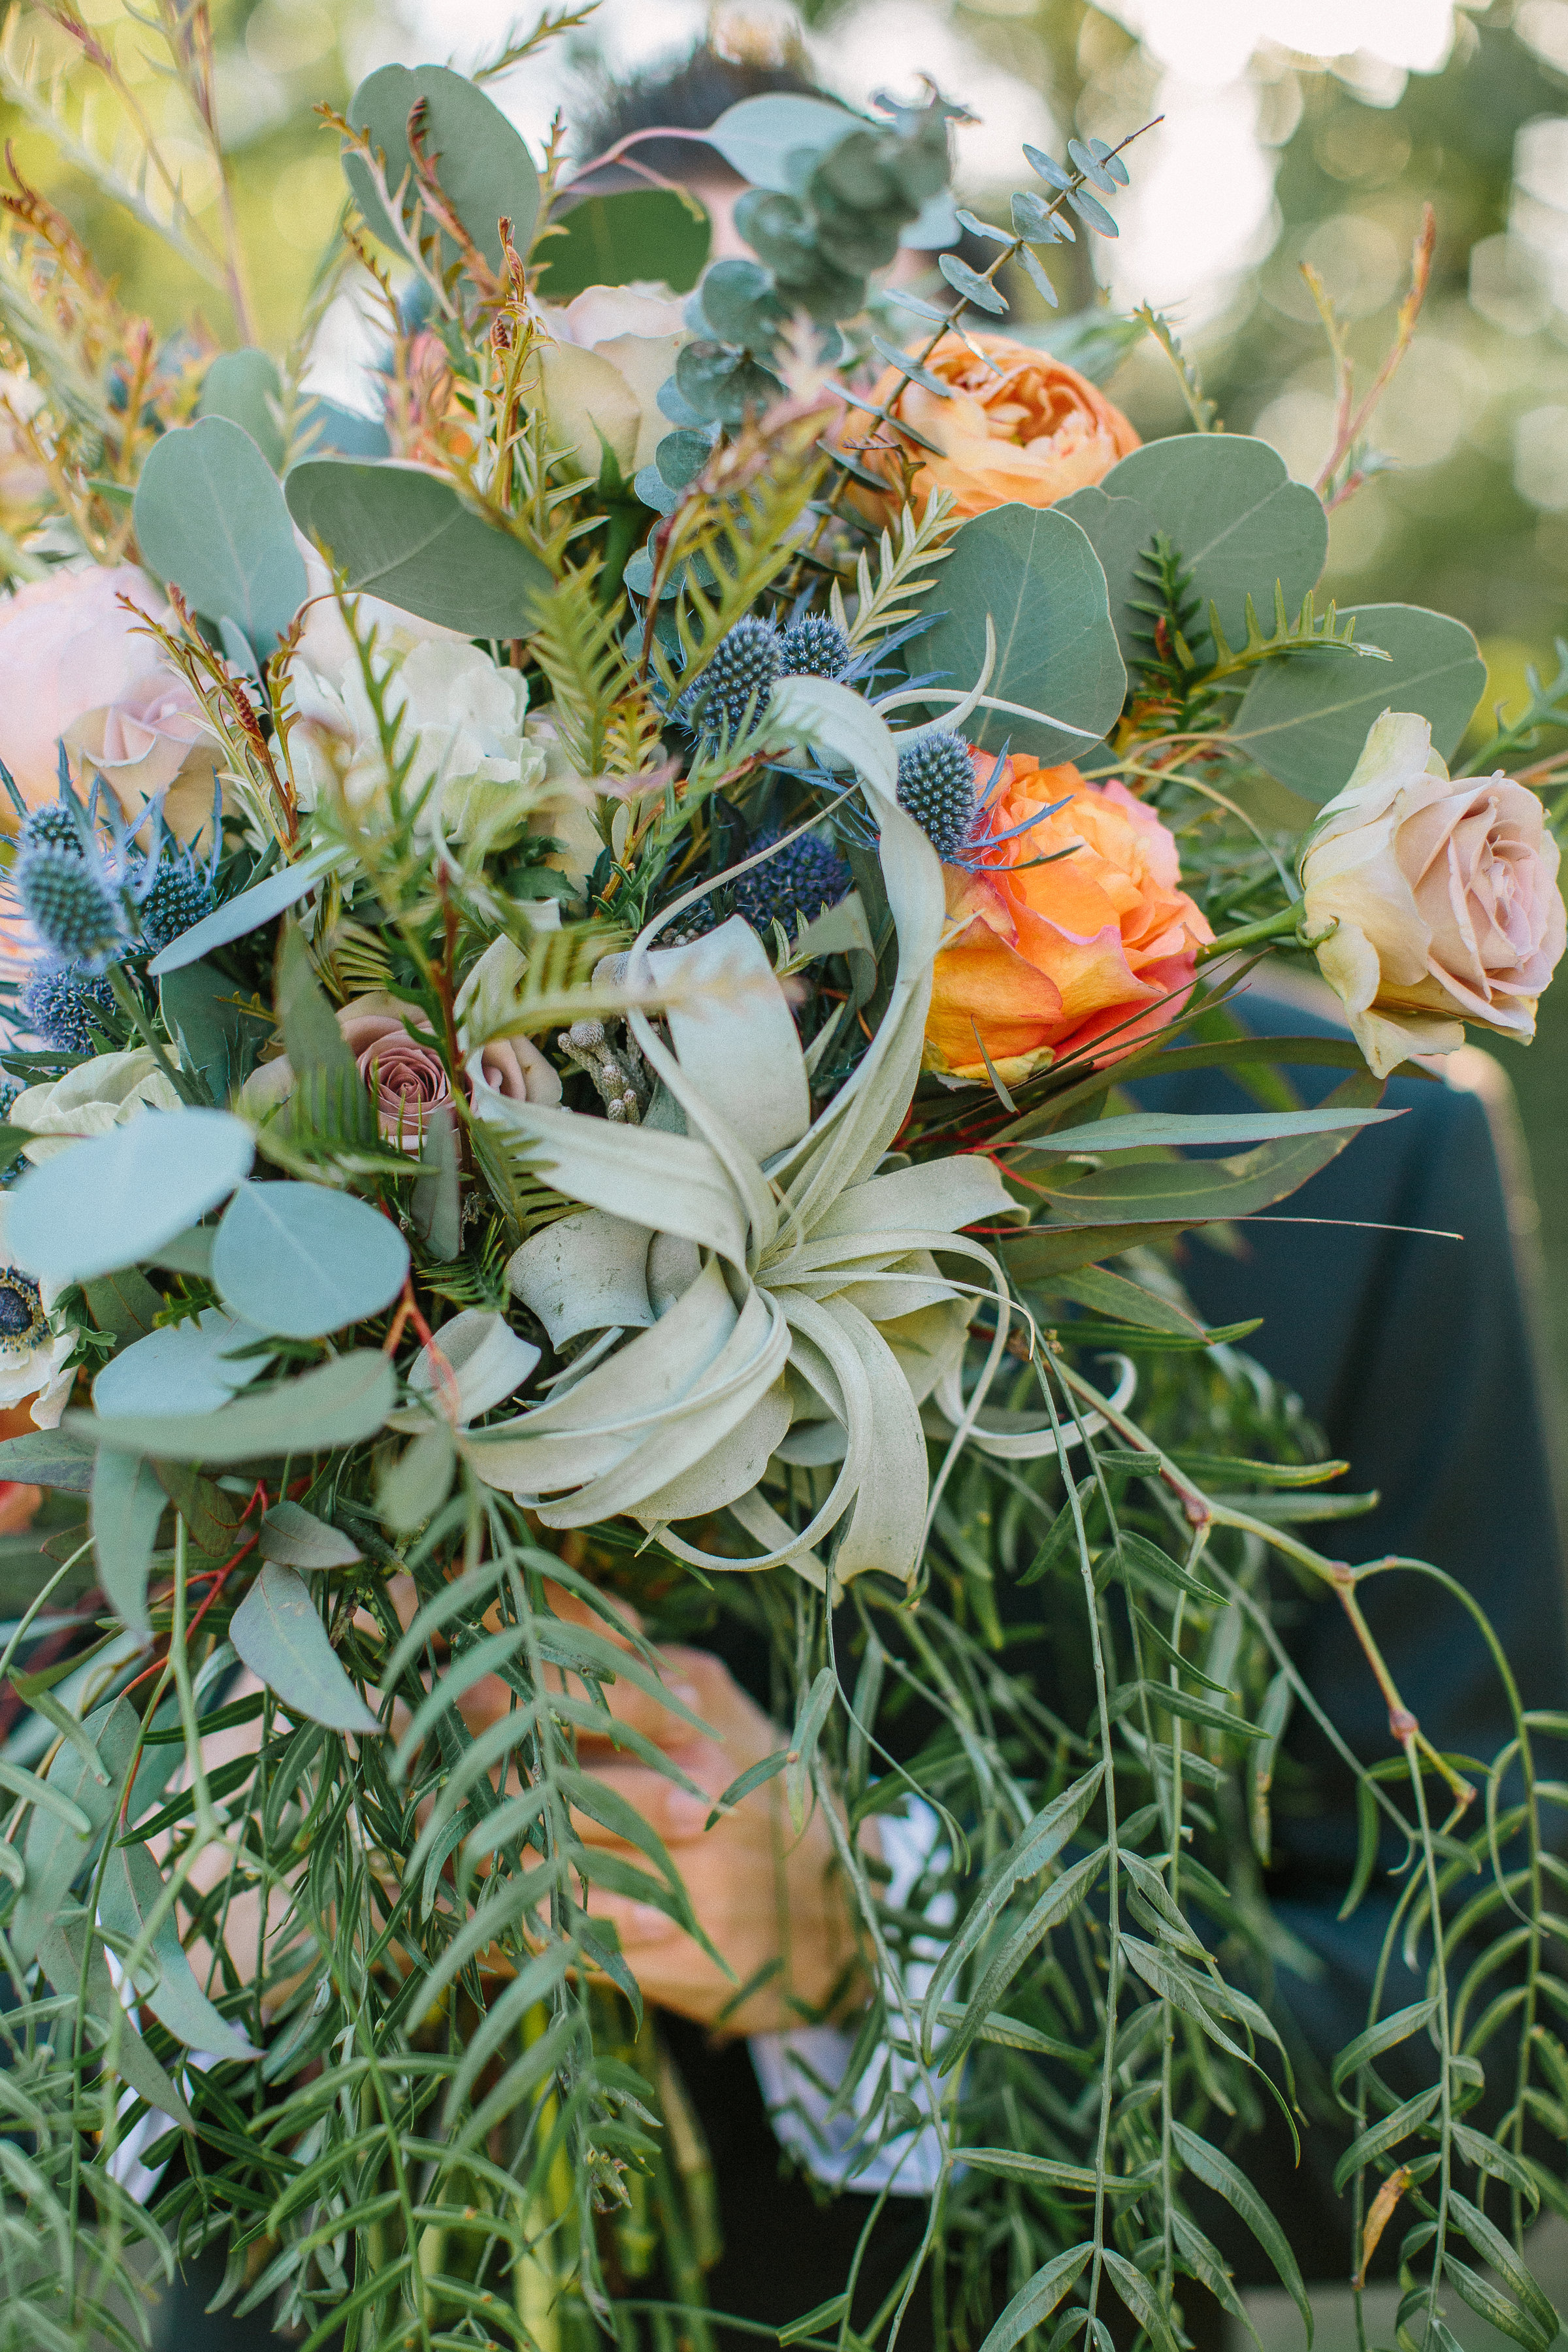 Ellen-Ashton-Photography-Peach-Creek-Ranch-Weddings-Wed-and-Prosper199